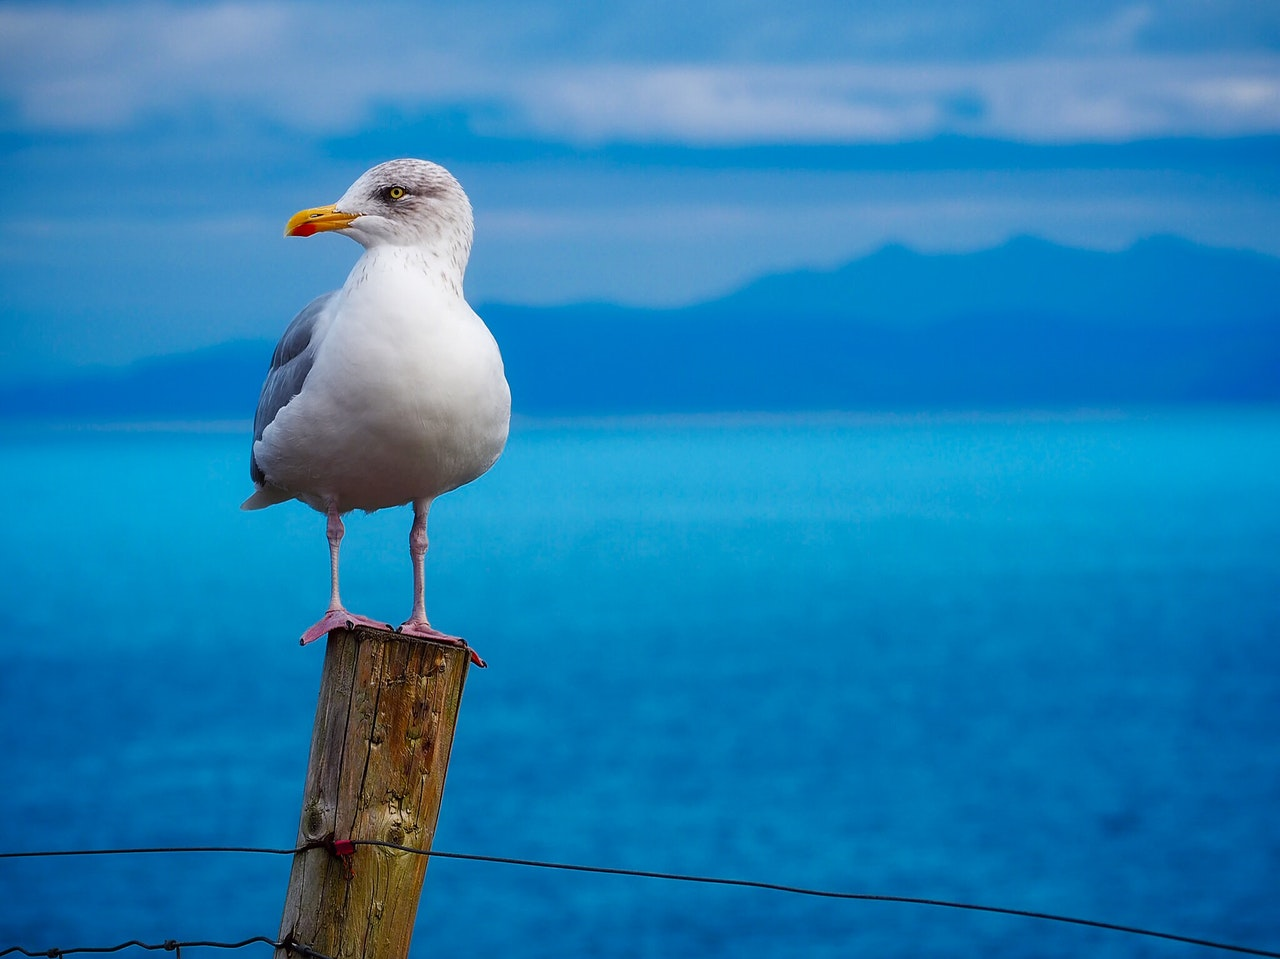 www.atozmomm.com summer bible study online bsf wordgo study of hebrews seagull